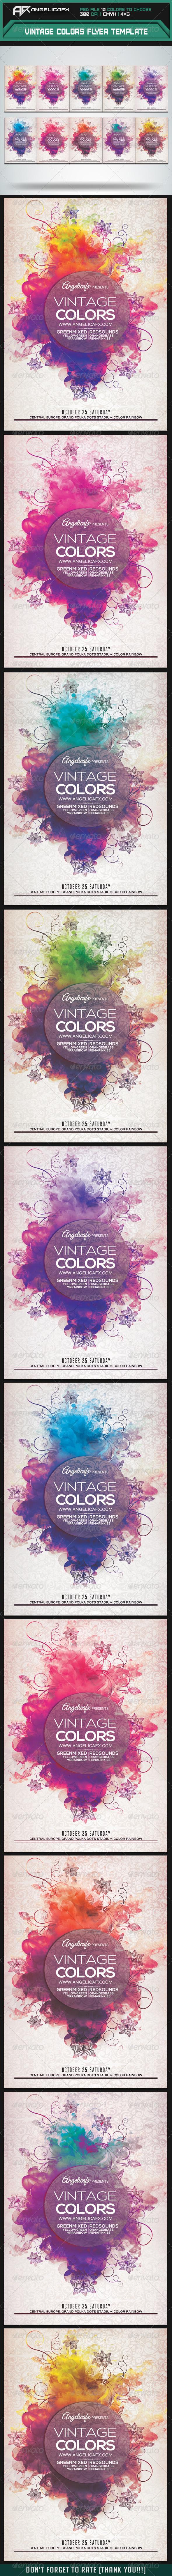 GraphicRiver Vintage Colors Flyer Template 8207713